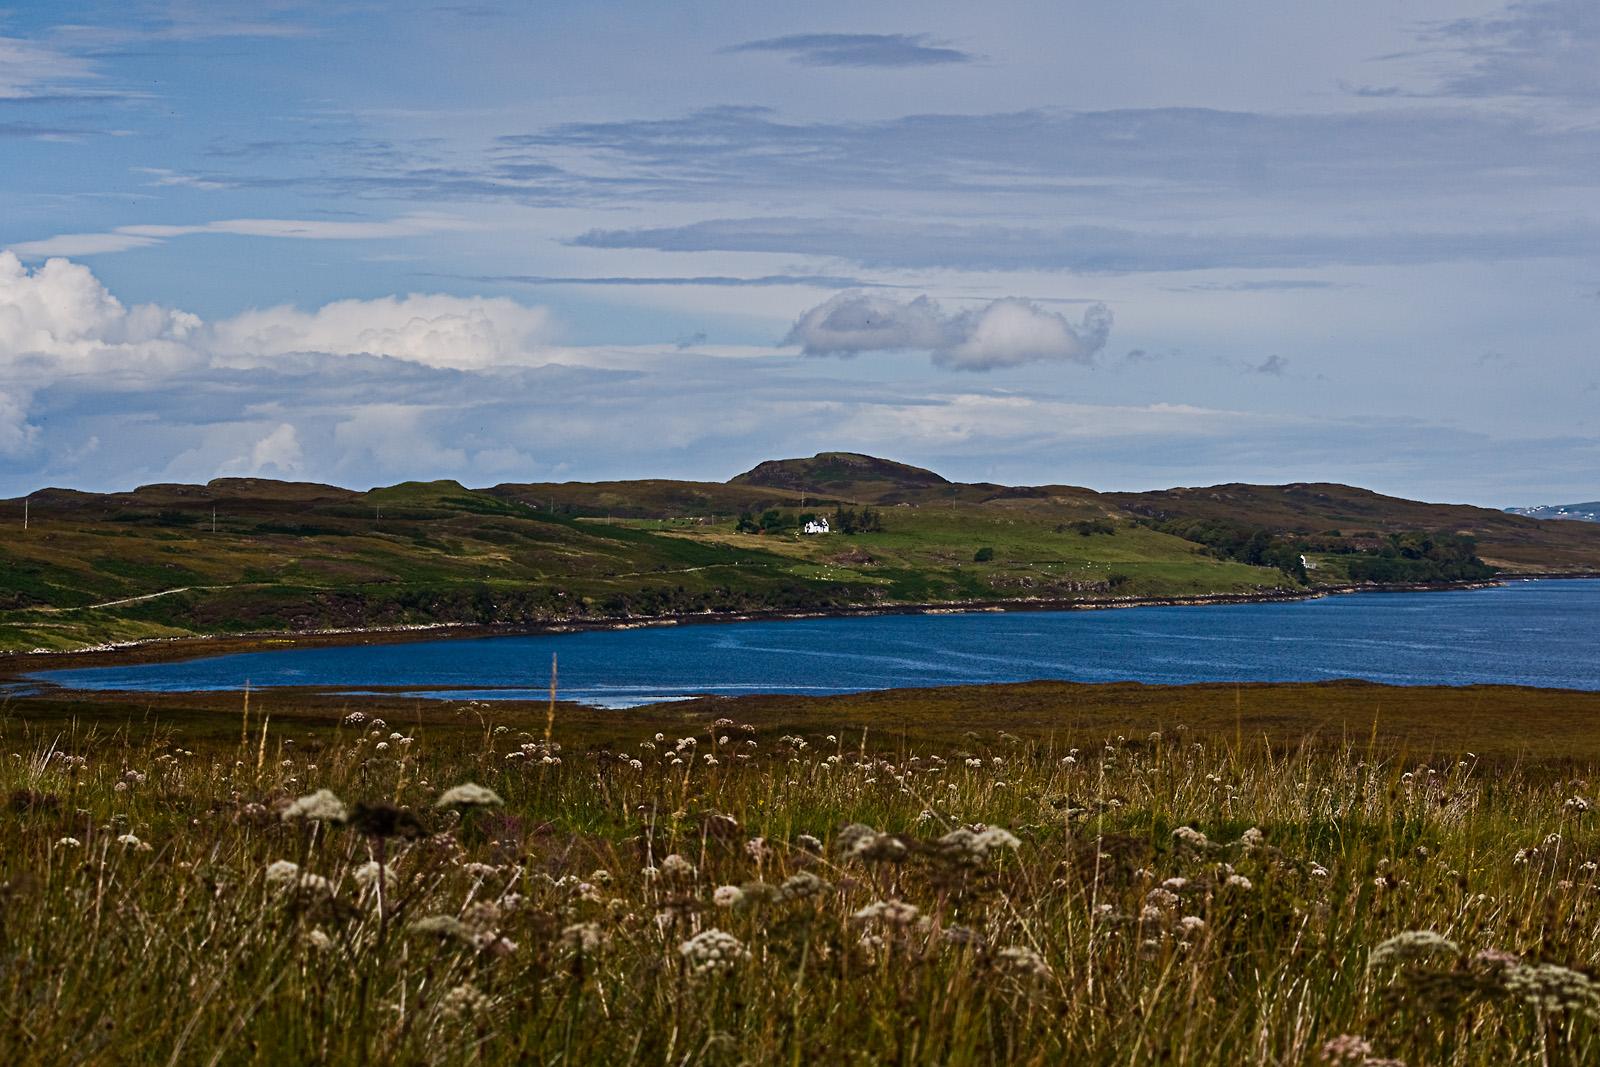 Schottland LXXXVIII - Skye